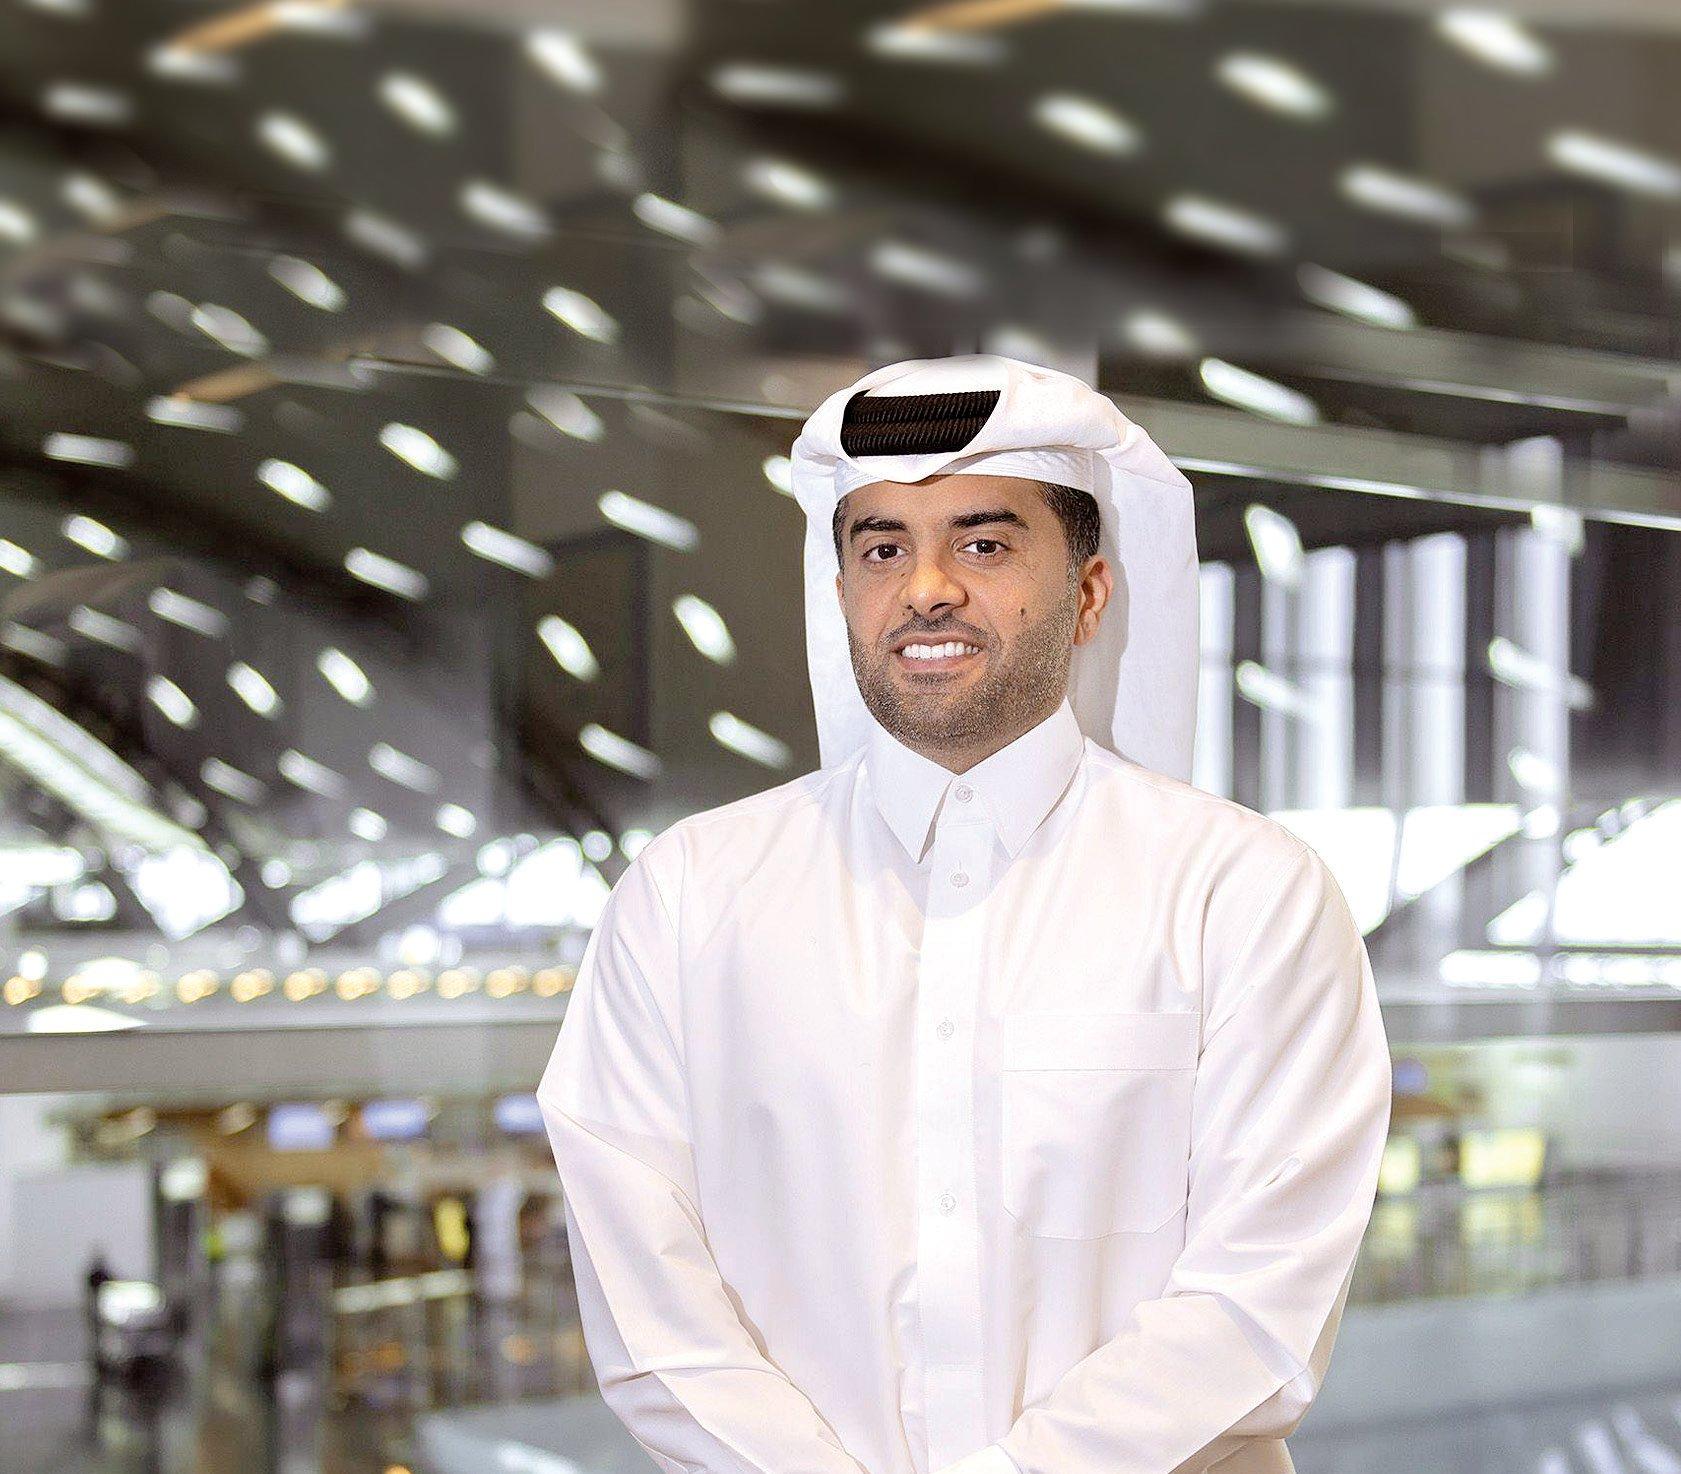 Engineer Badr Mohammed Al-Mir